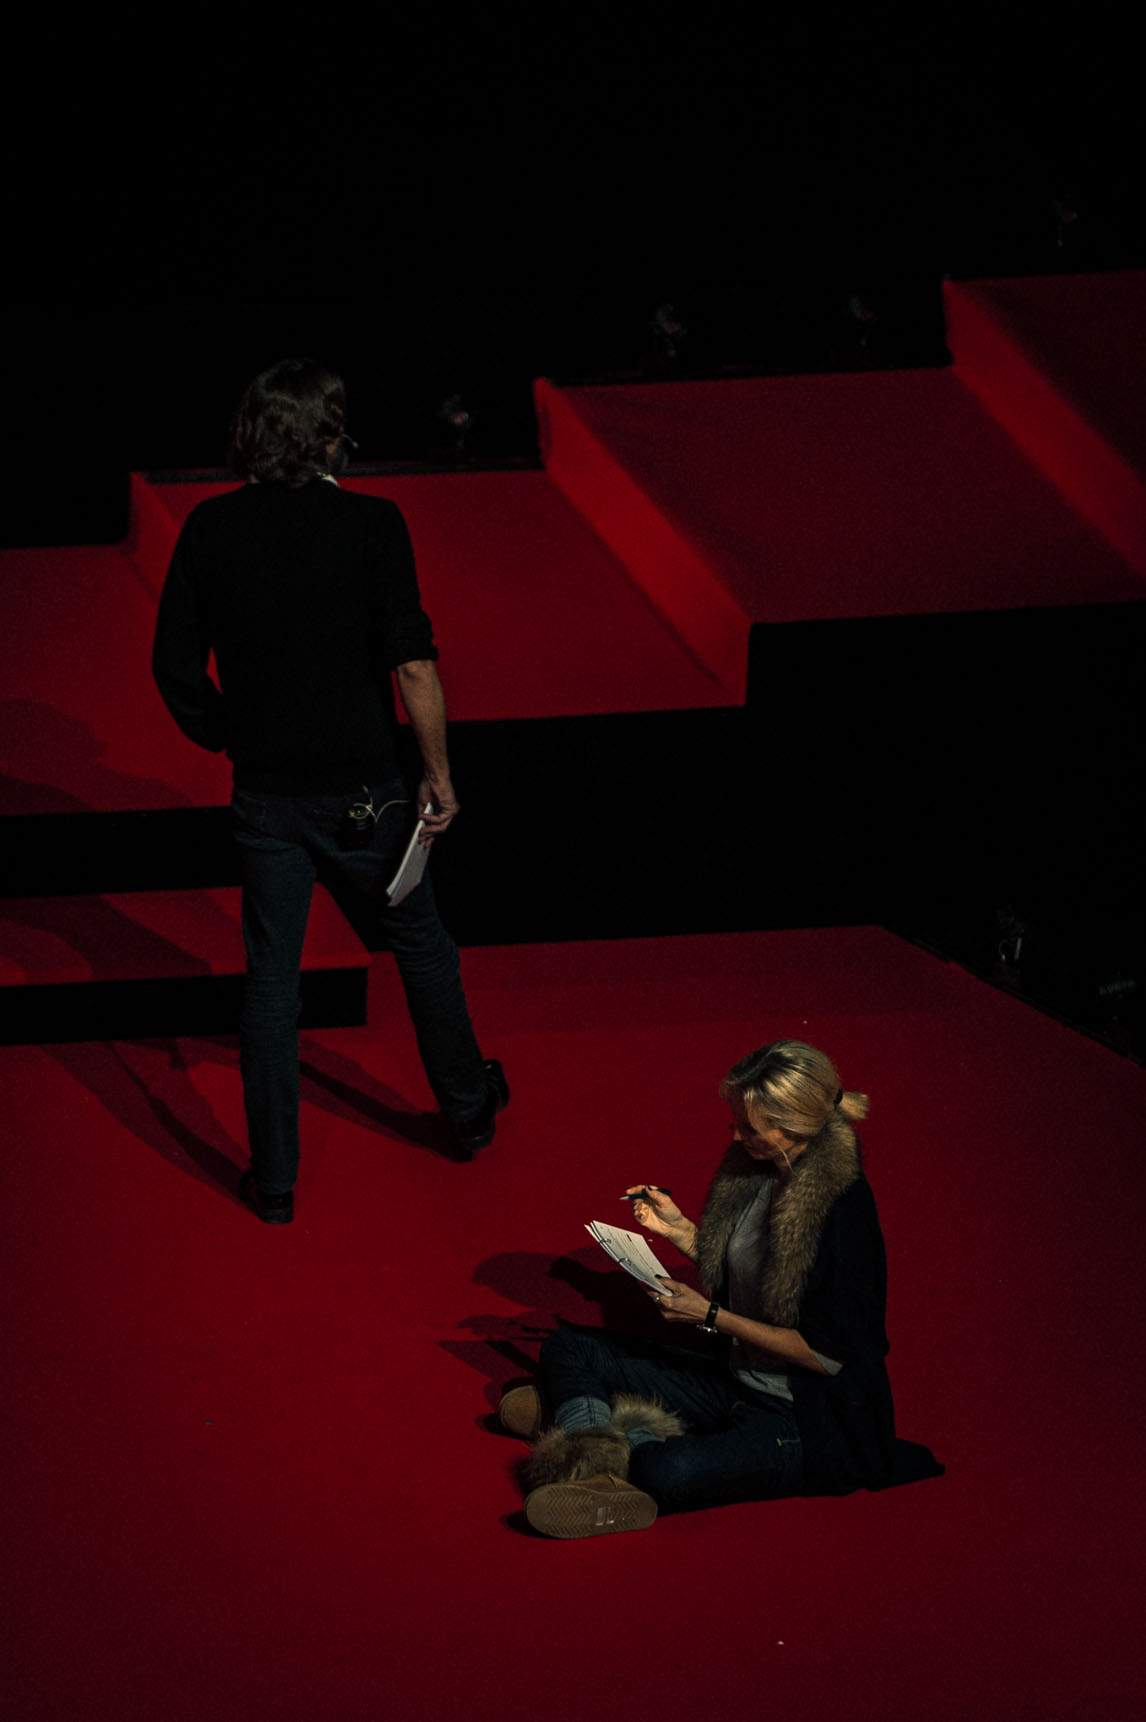 Frédéric Beigbeder et Adriana Karembeu (présentateurs de la cérémonie du GPHG 2012)